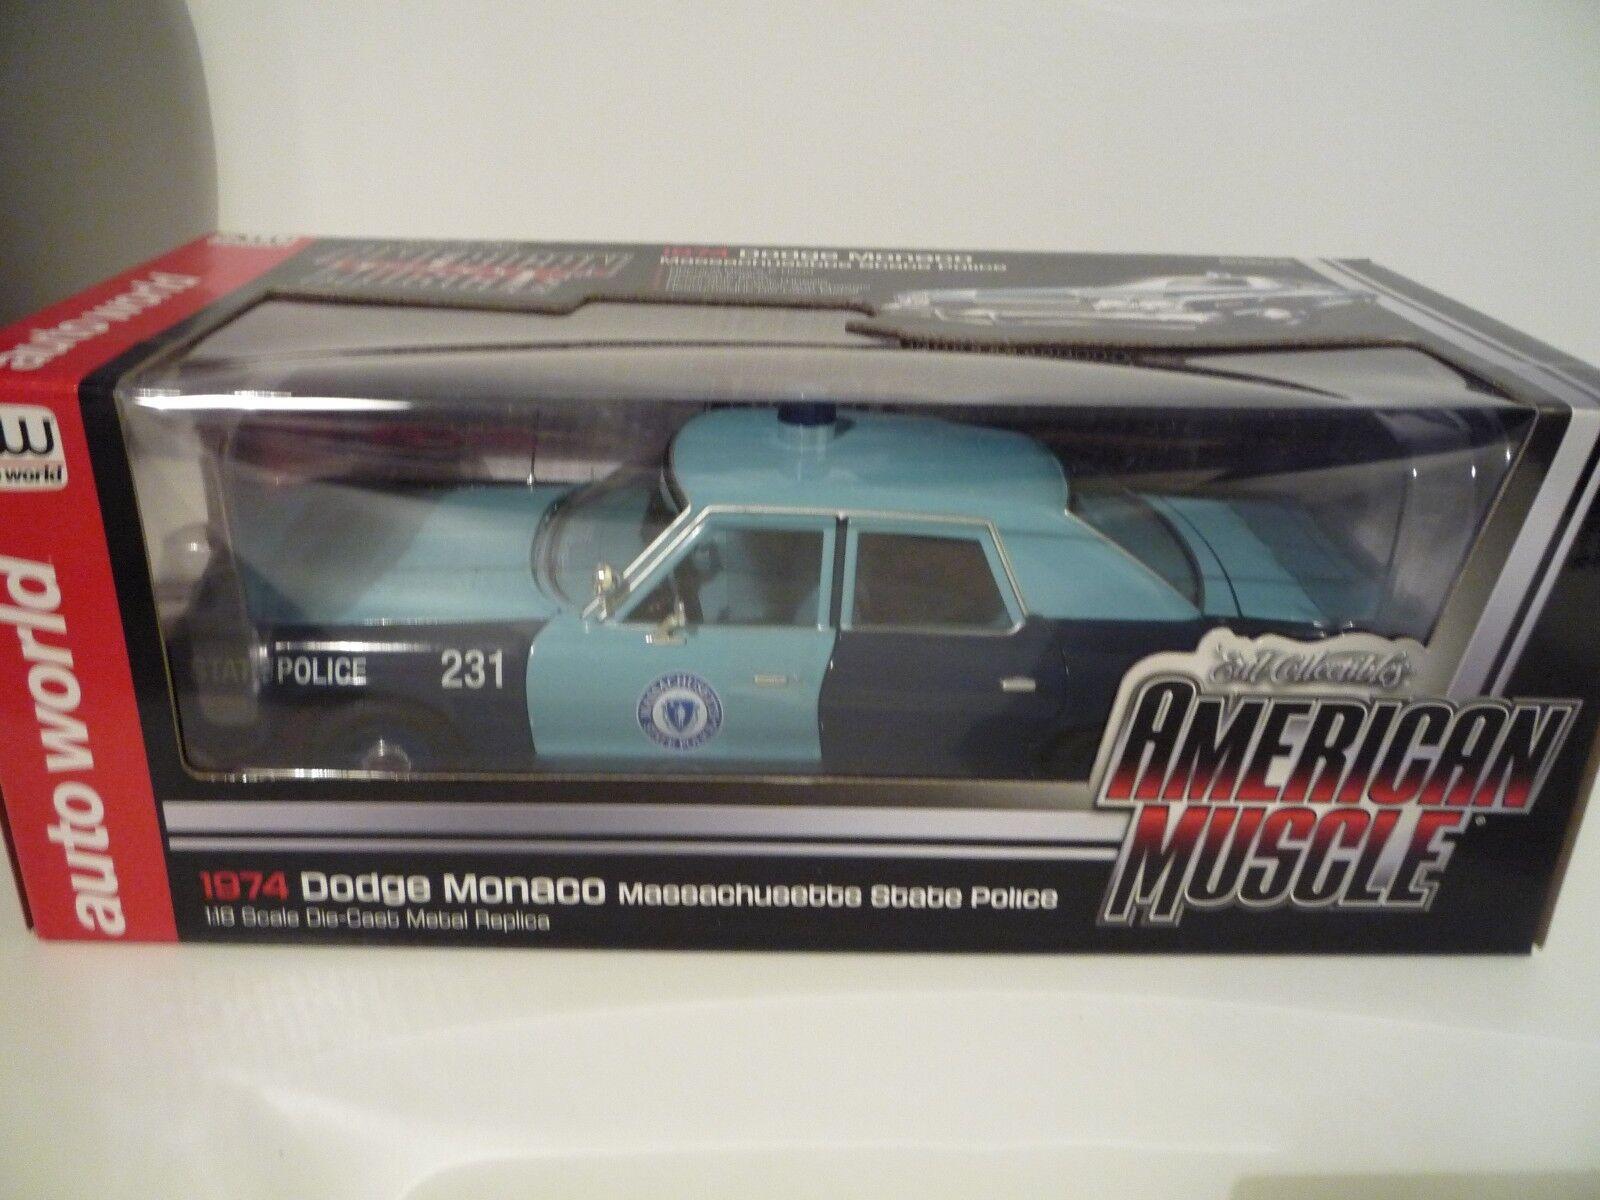 Auto world 1 1 1 18 AMM1023 - Dodge Monaco Police Massachusetts 1974 1a2fb9